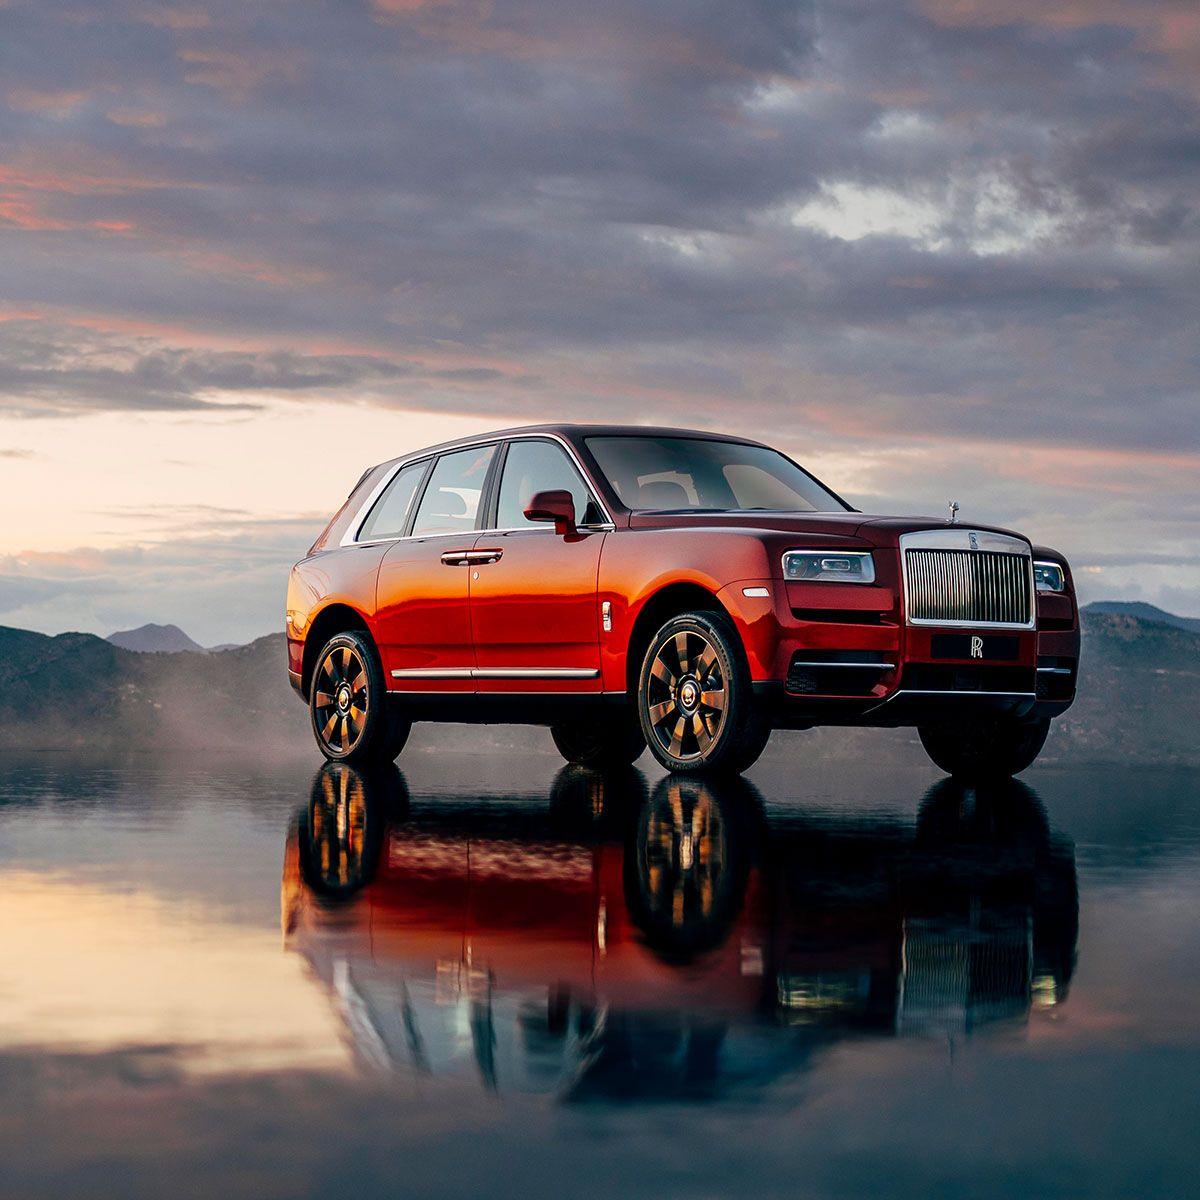 Largest Volvo Suv: New Rolls-Royce Cullinan SUV Revealed